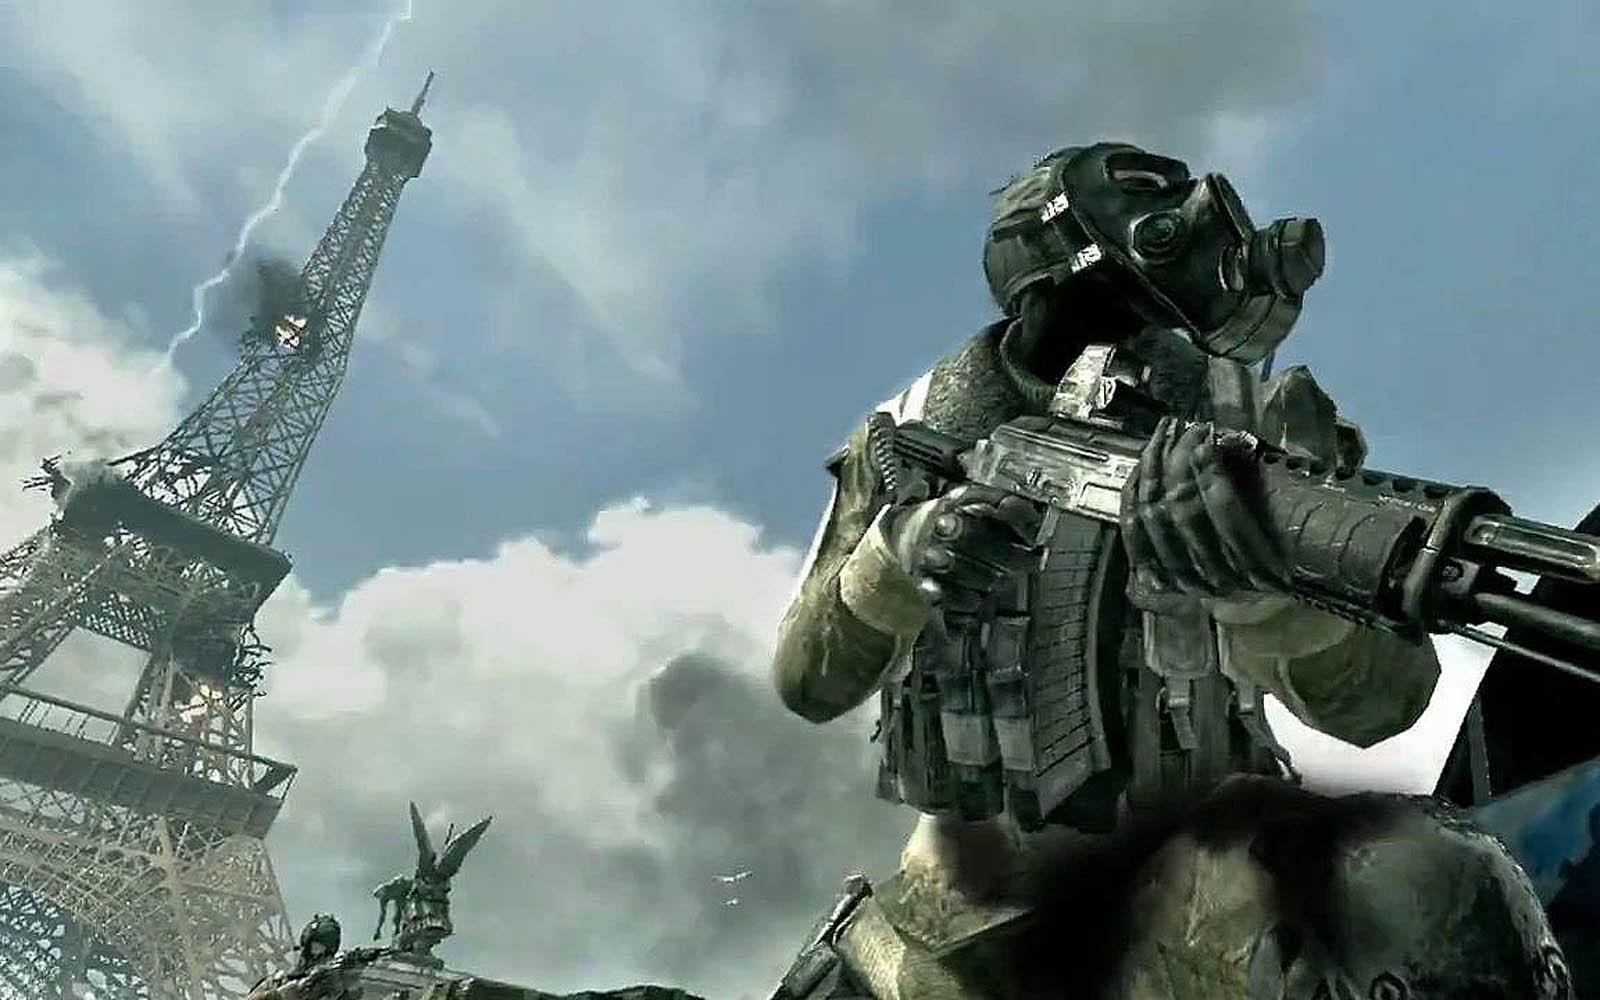 47+] Call Of Duty 4 Wallpaper on WallpaperSafari